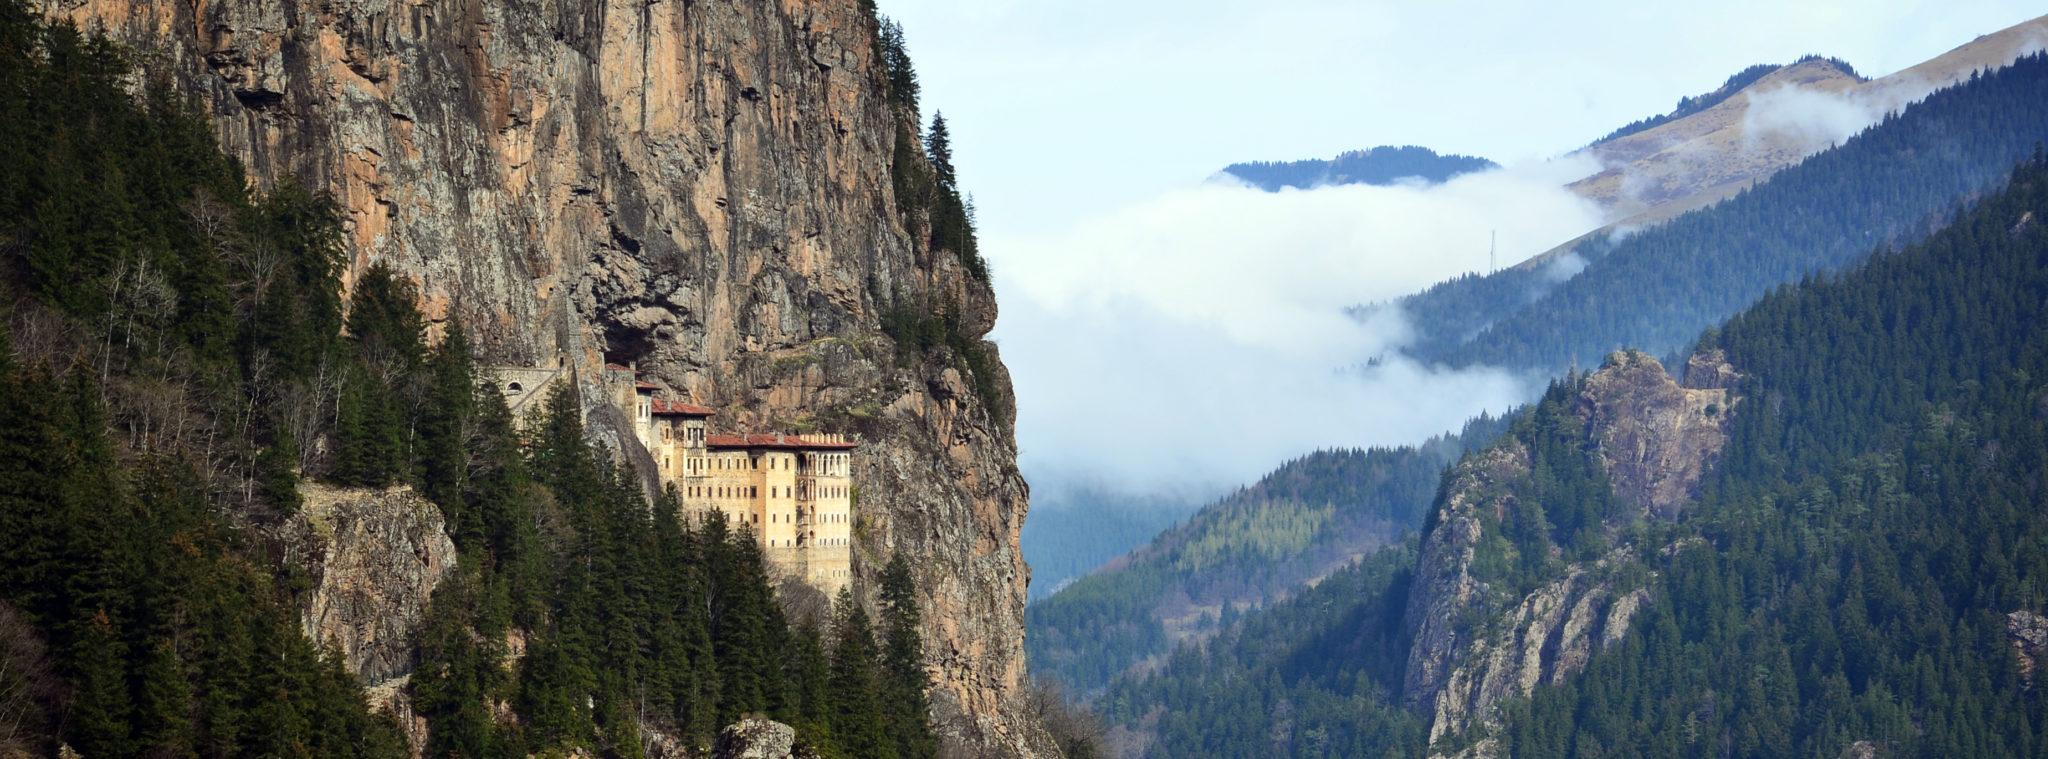 Kloster-Sumela-Landschaft-Slider